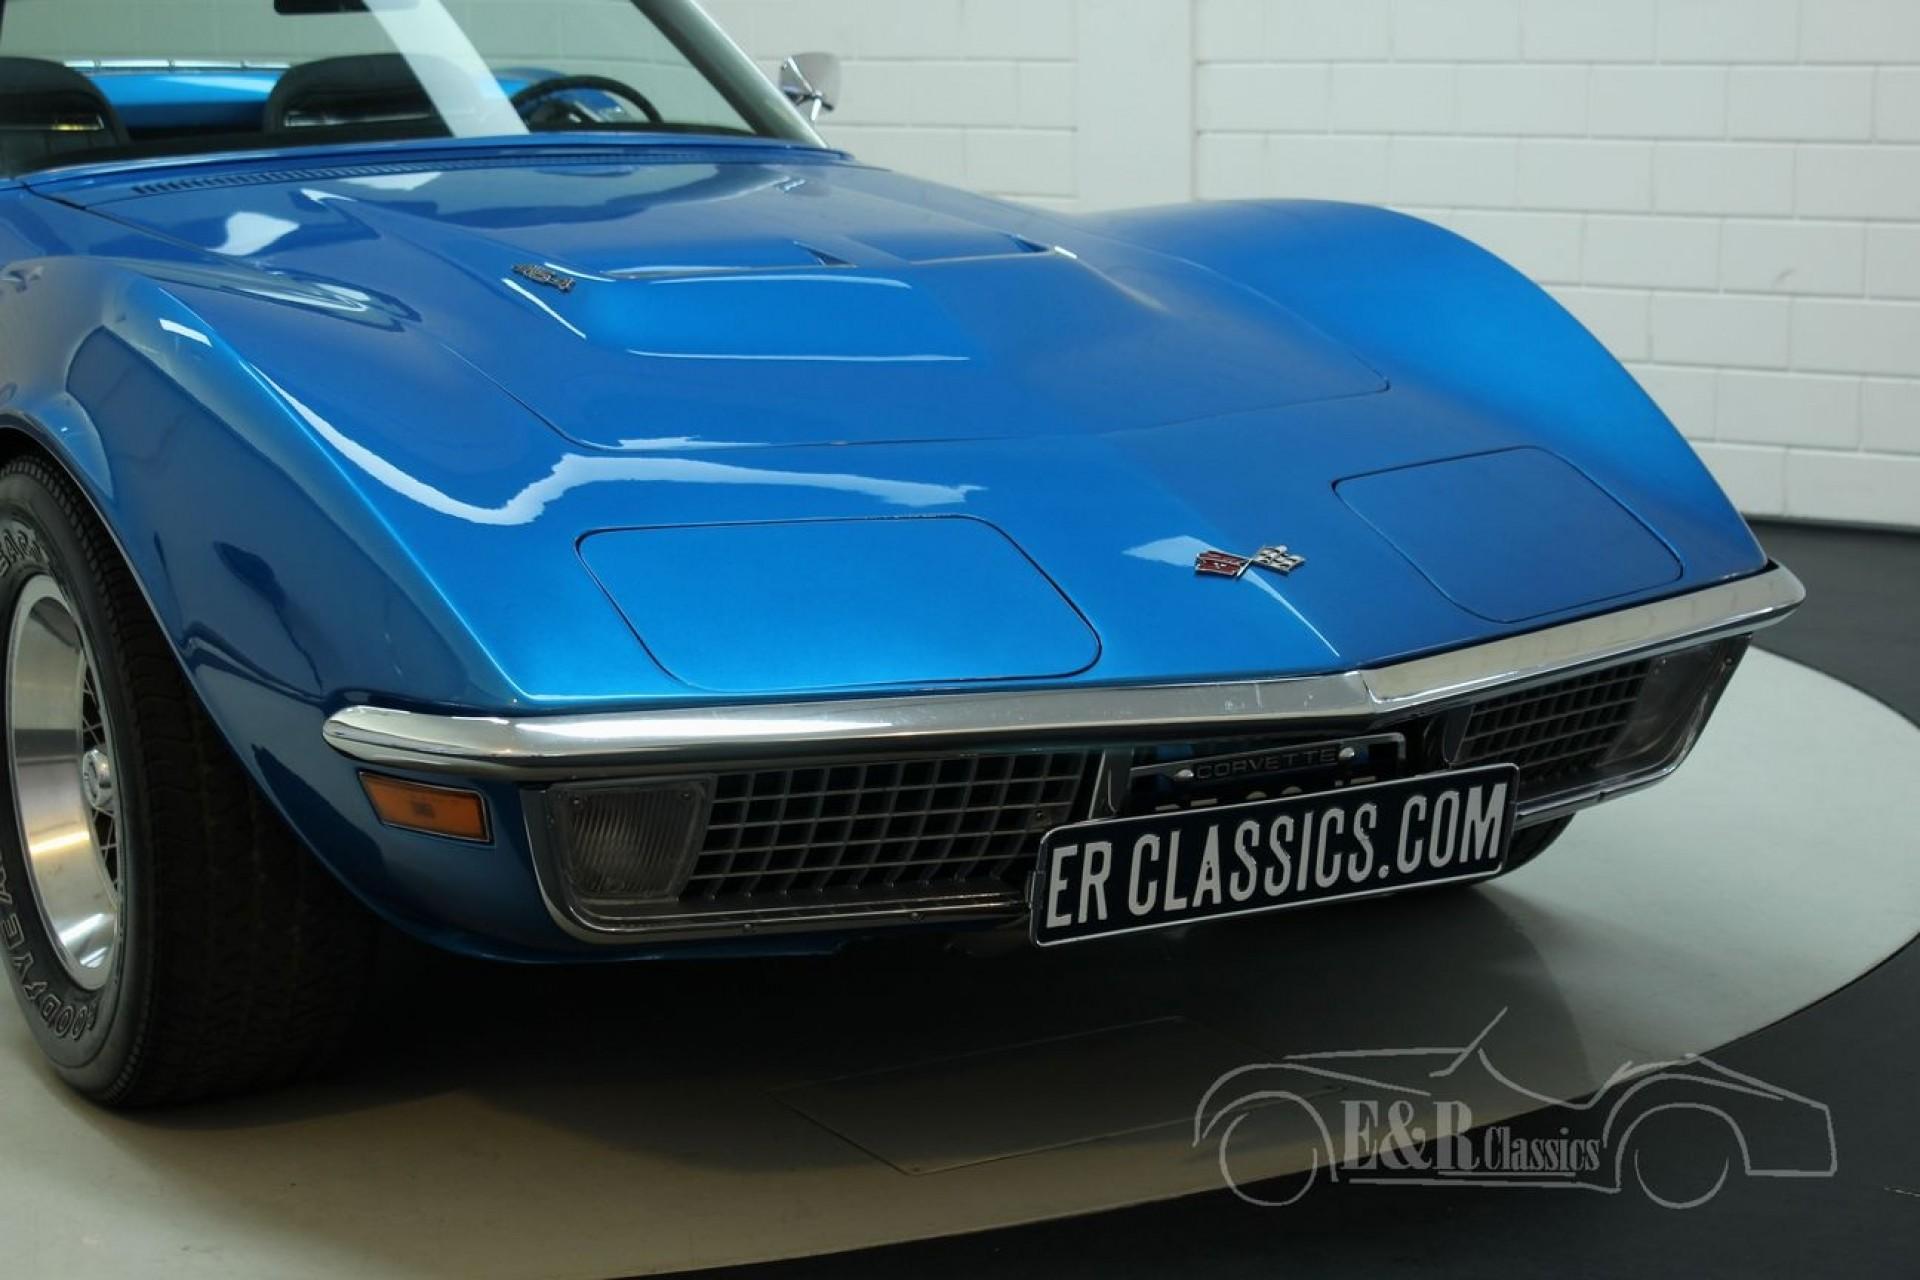 chevrolet corvette c3 1971 cabriolet vendre erclassics. Black Bedroom Furniture Sets. Home Design Ideas